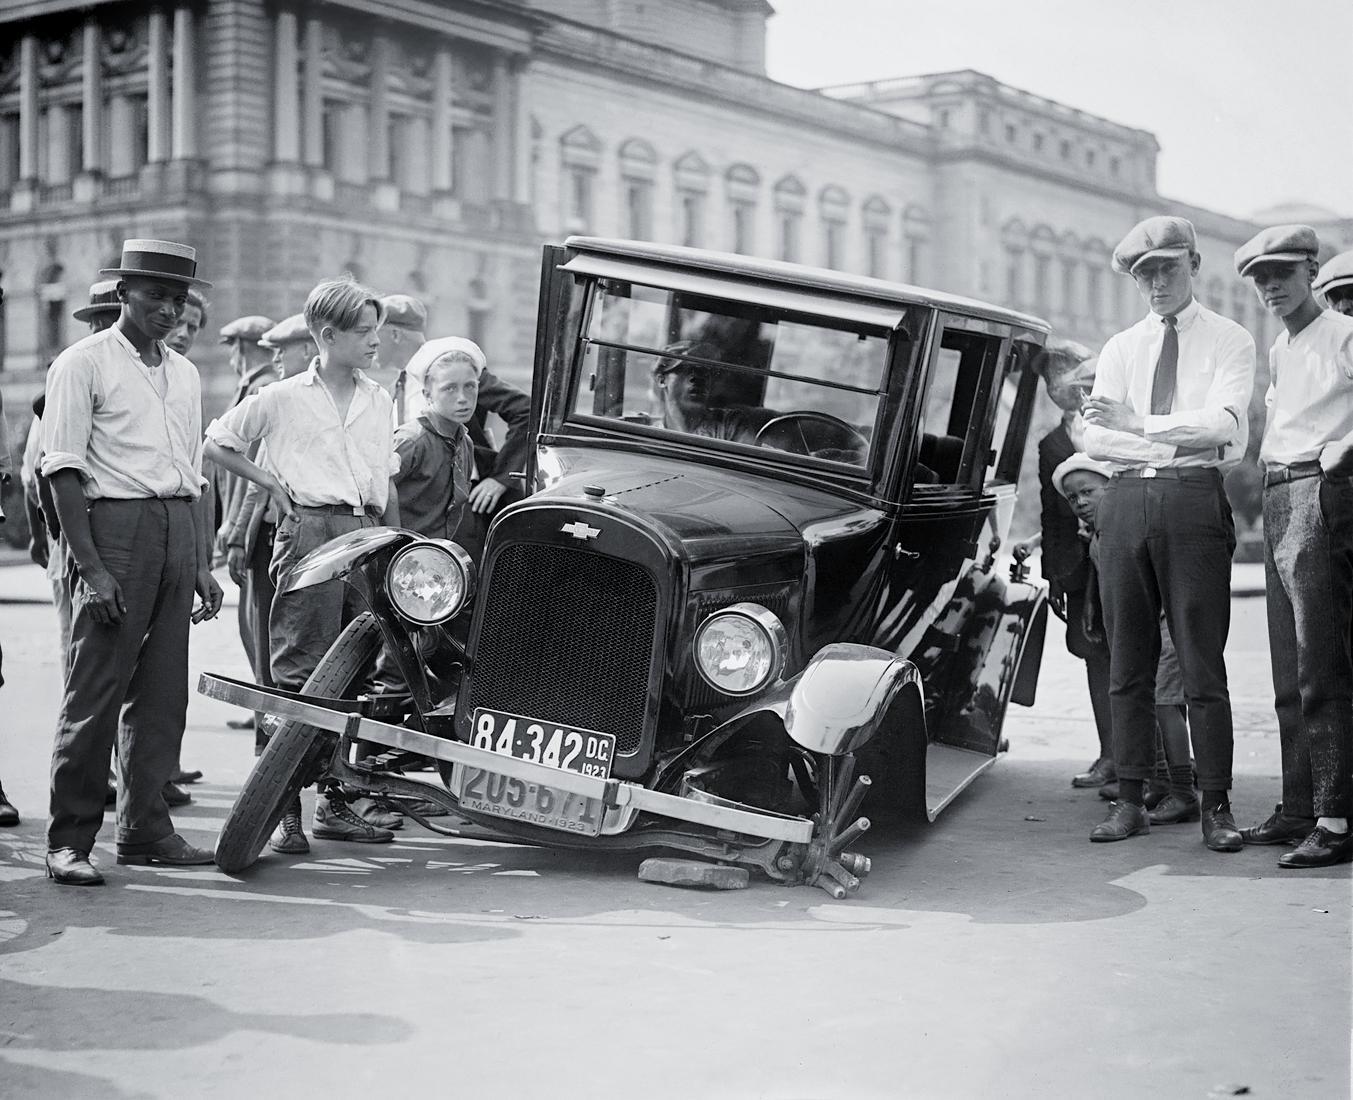 Chevrolet-breakdown-maryland-1923 | Chevrolet Vintage Cars ...